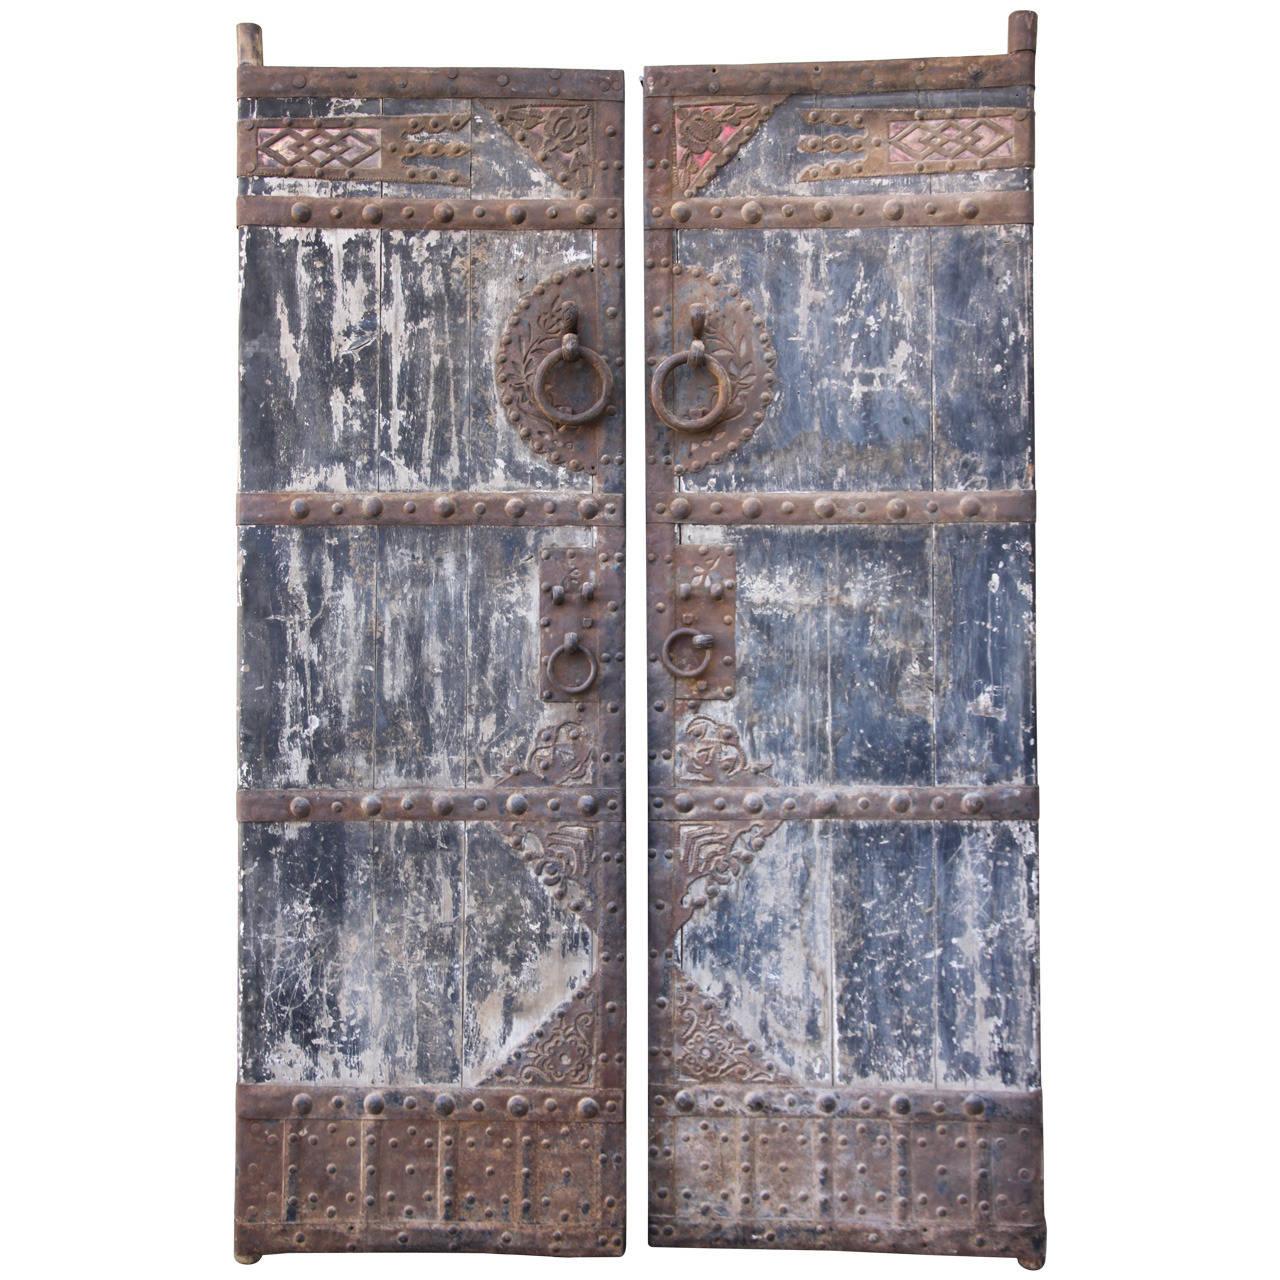 1280 #705950 Pair Of Asian Painted And Metal Doors At 1stdibs save image Painting Metal Doors 47471280